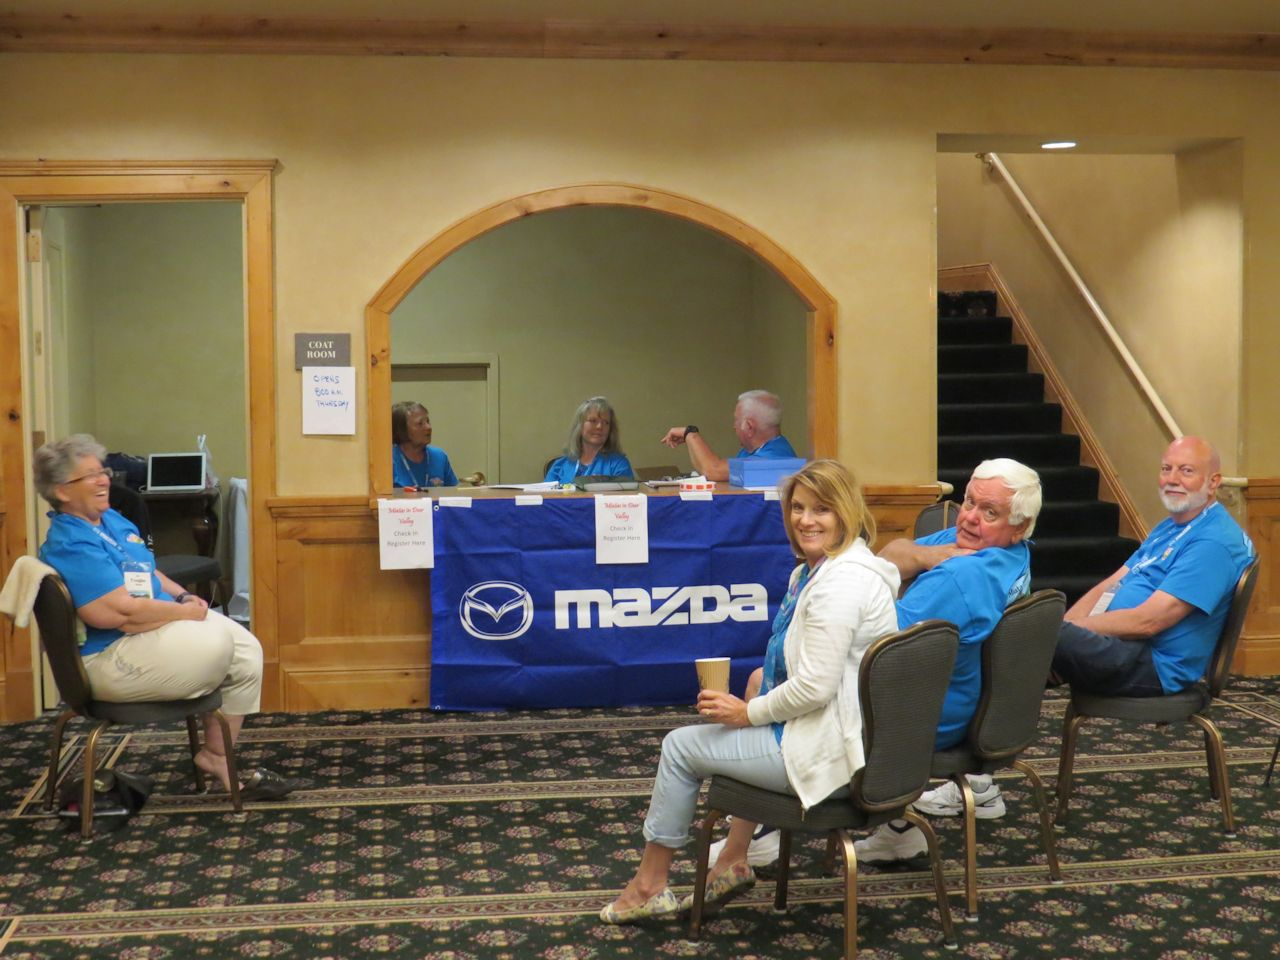 NA Mazda and registration